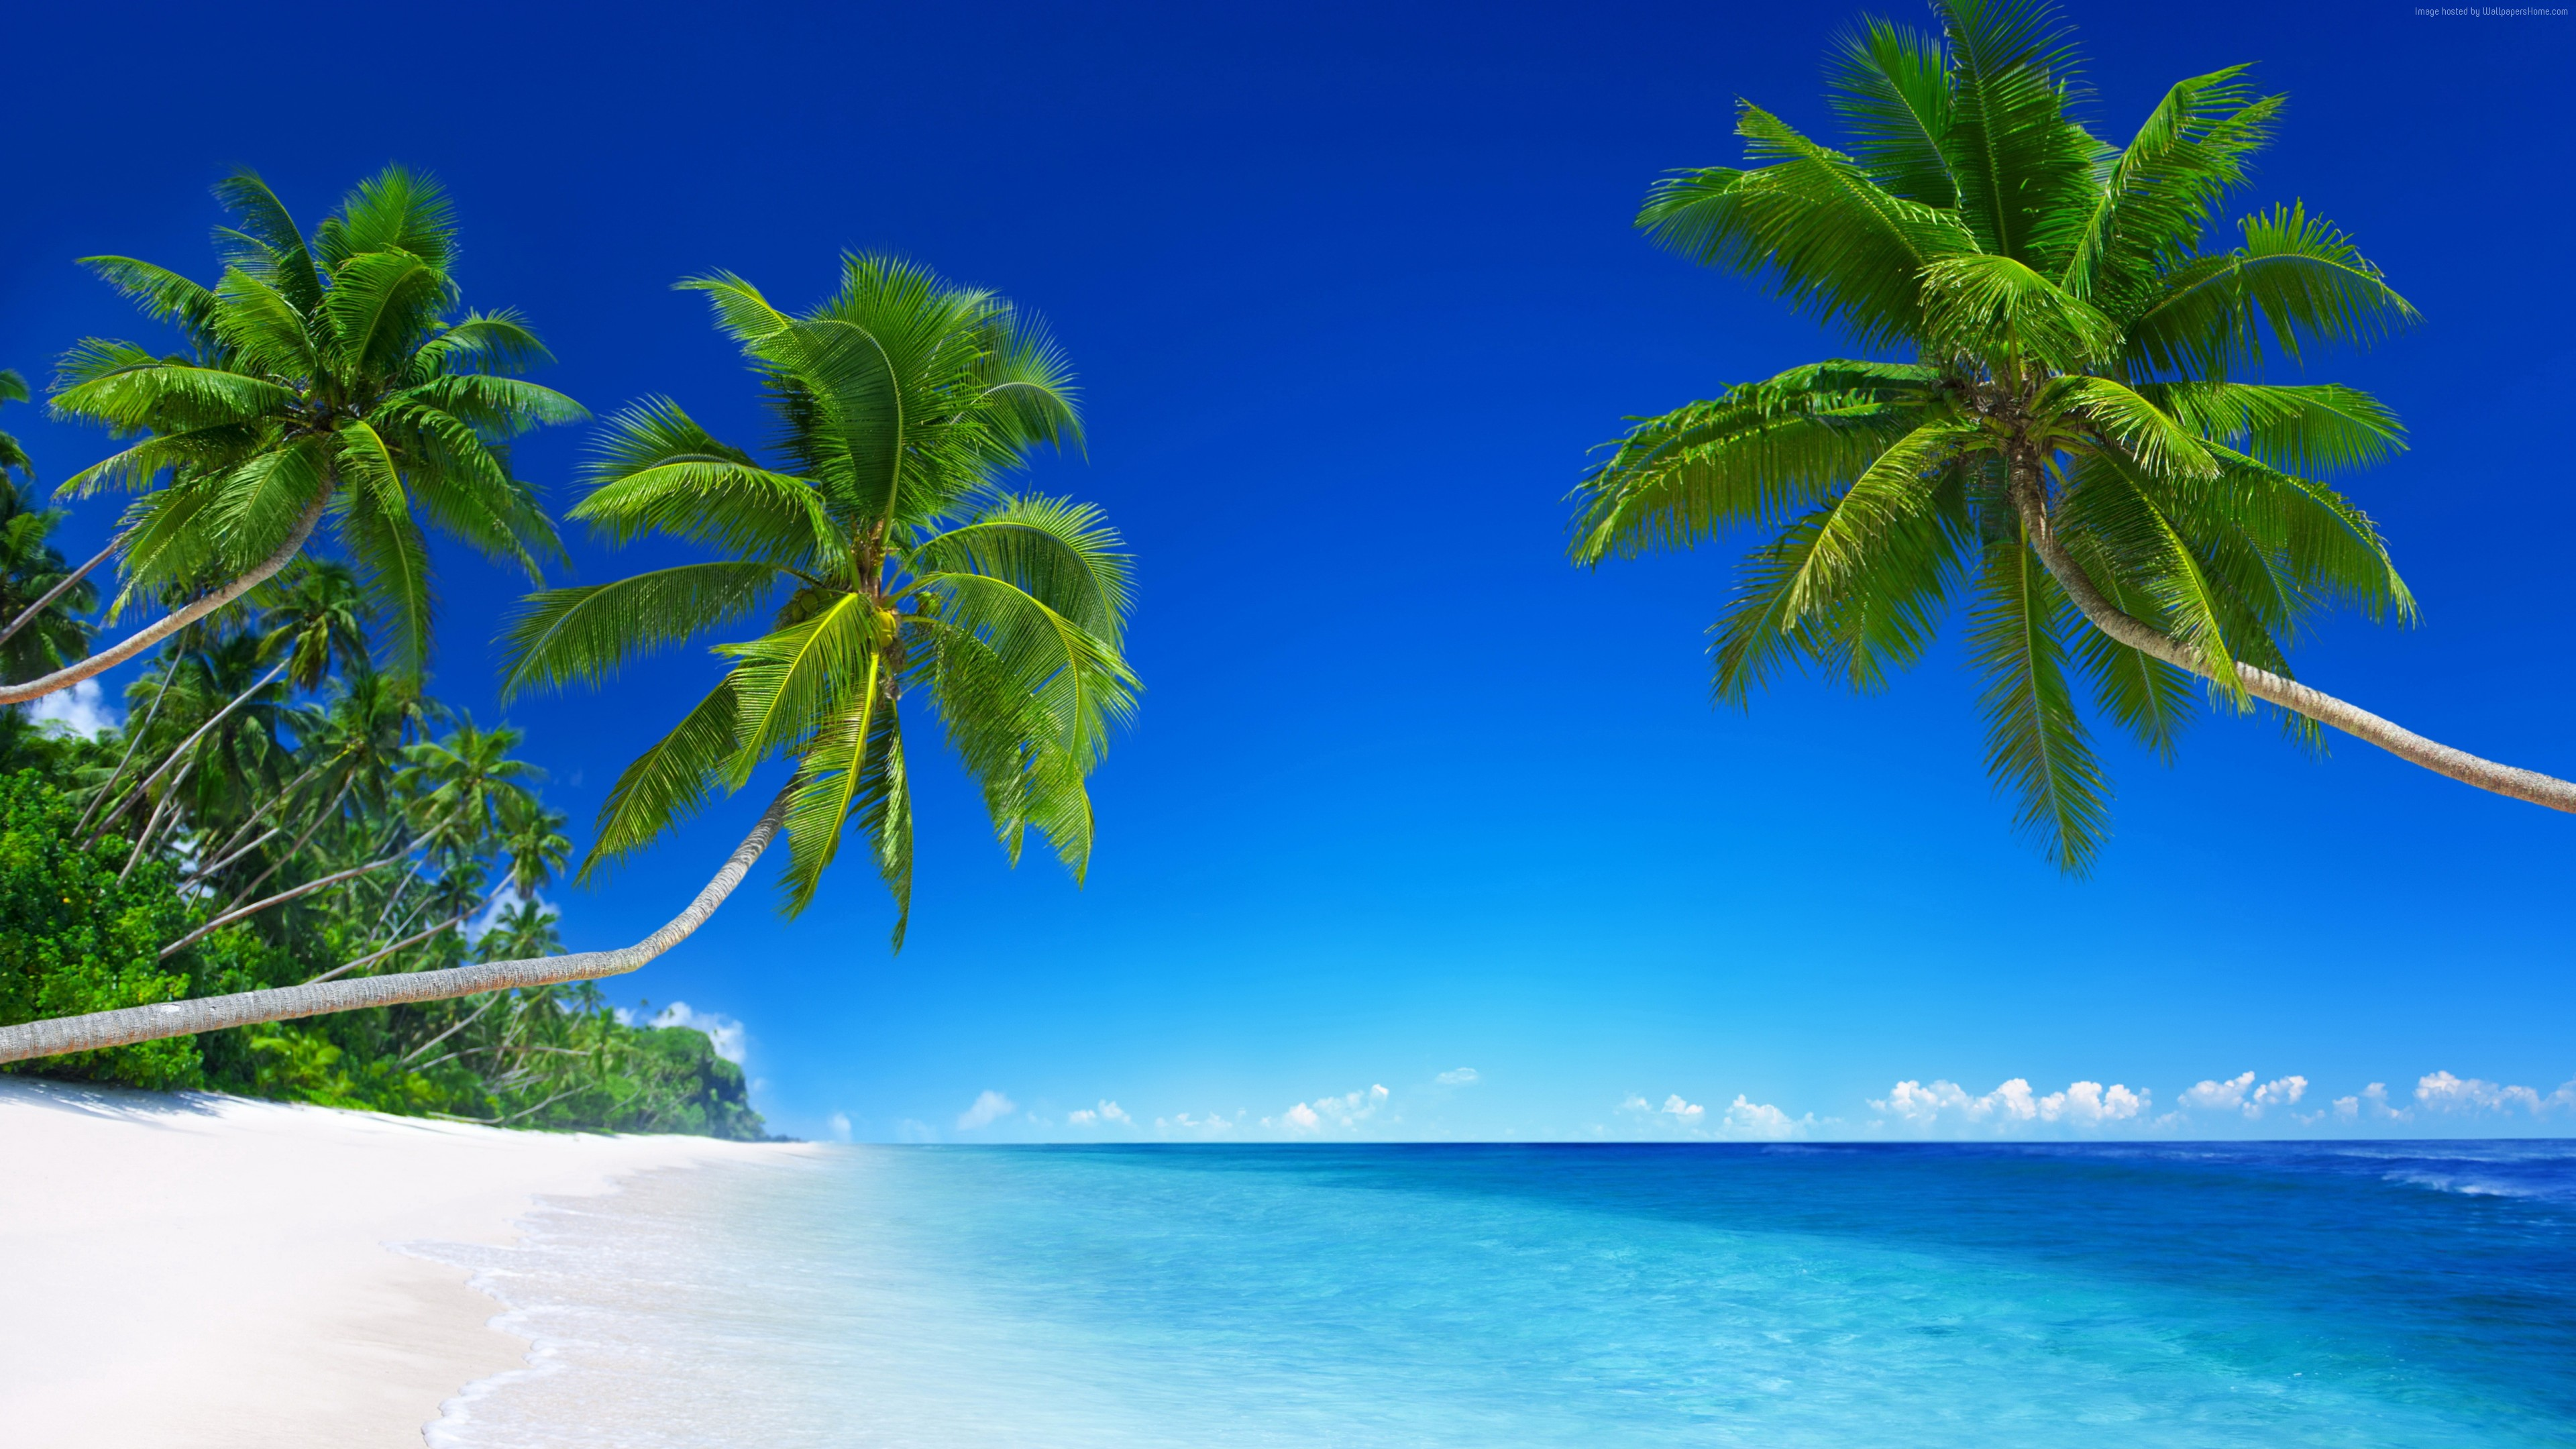 Wallpaper Tropical Beach 5k 4k 8k Paradise Palms Sea Blue